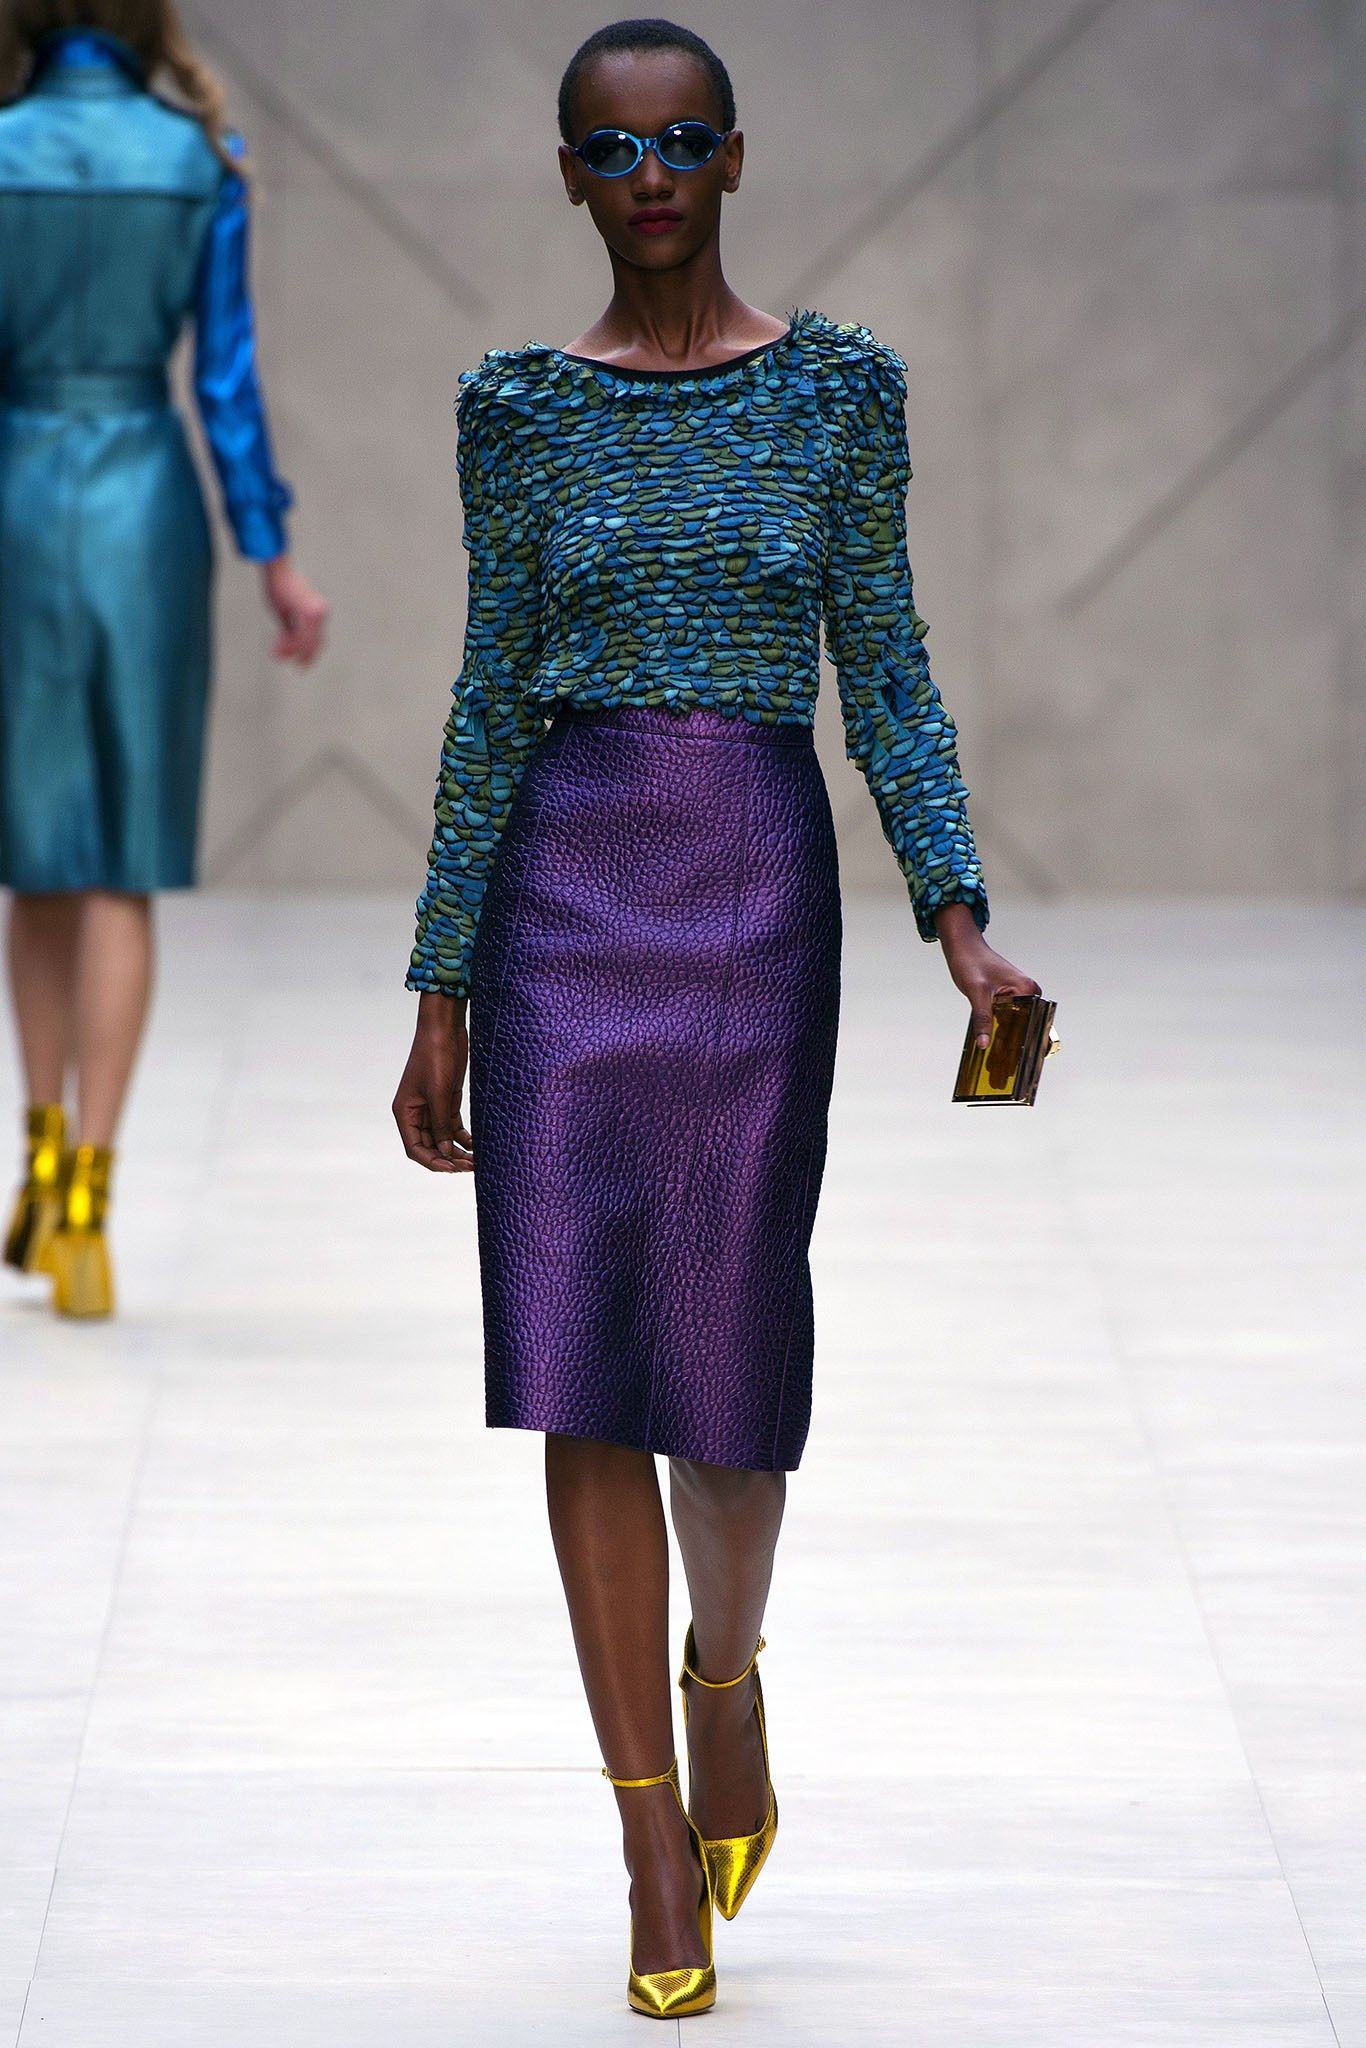 Burberry Spring 8 Ready-to-Wear Fashion Show  London fashion